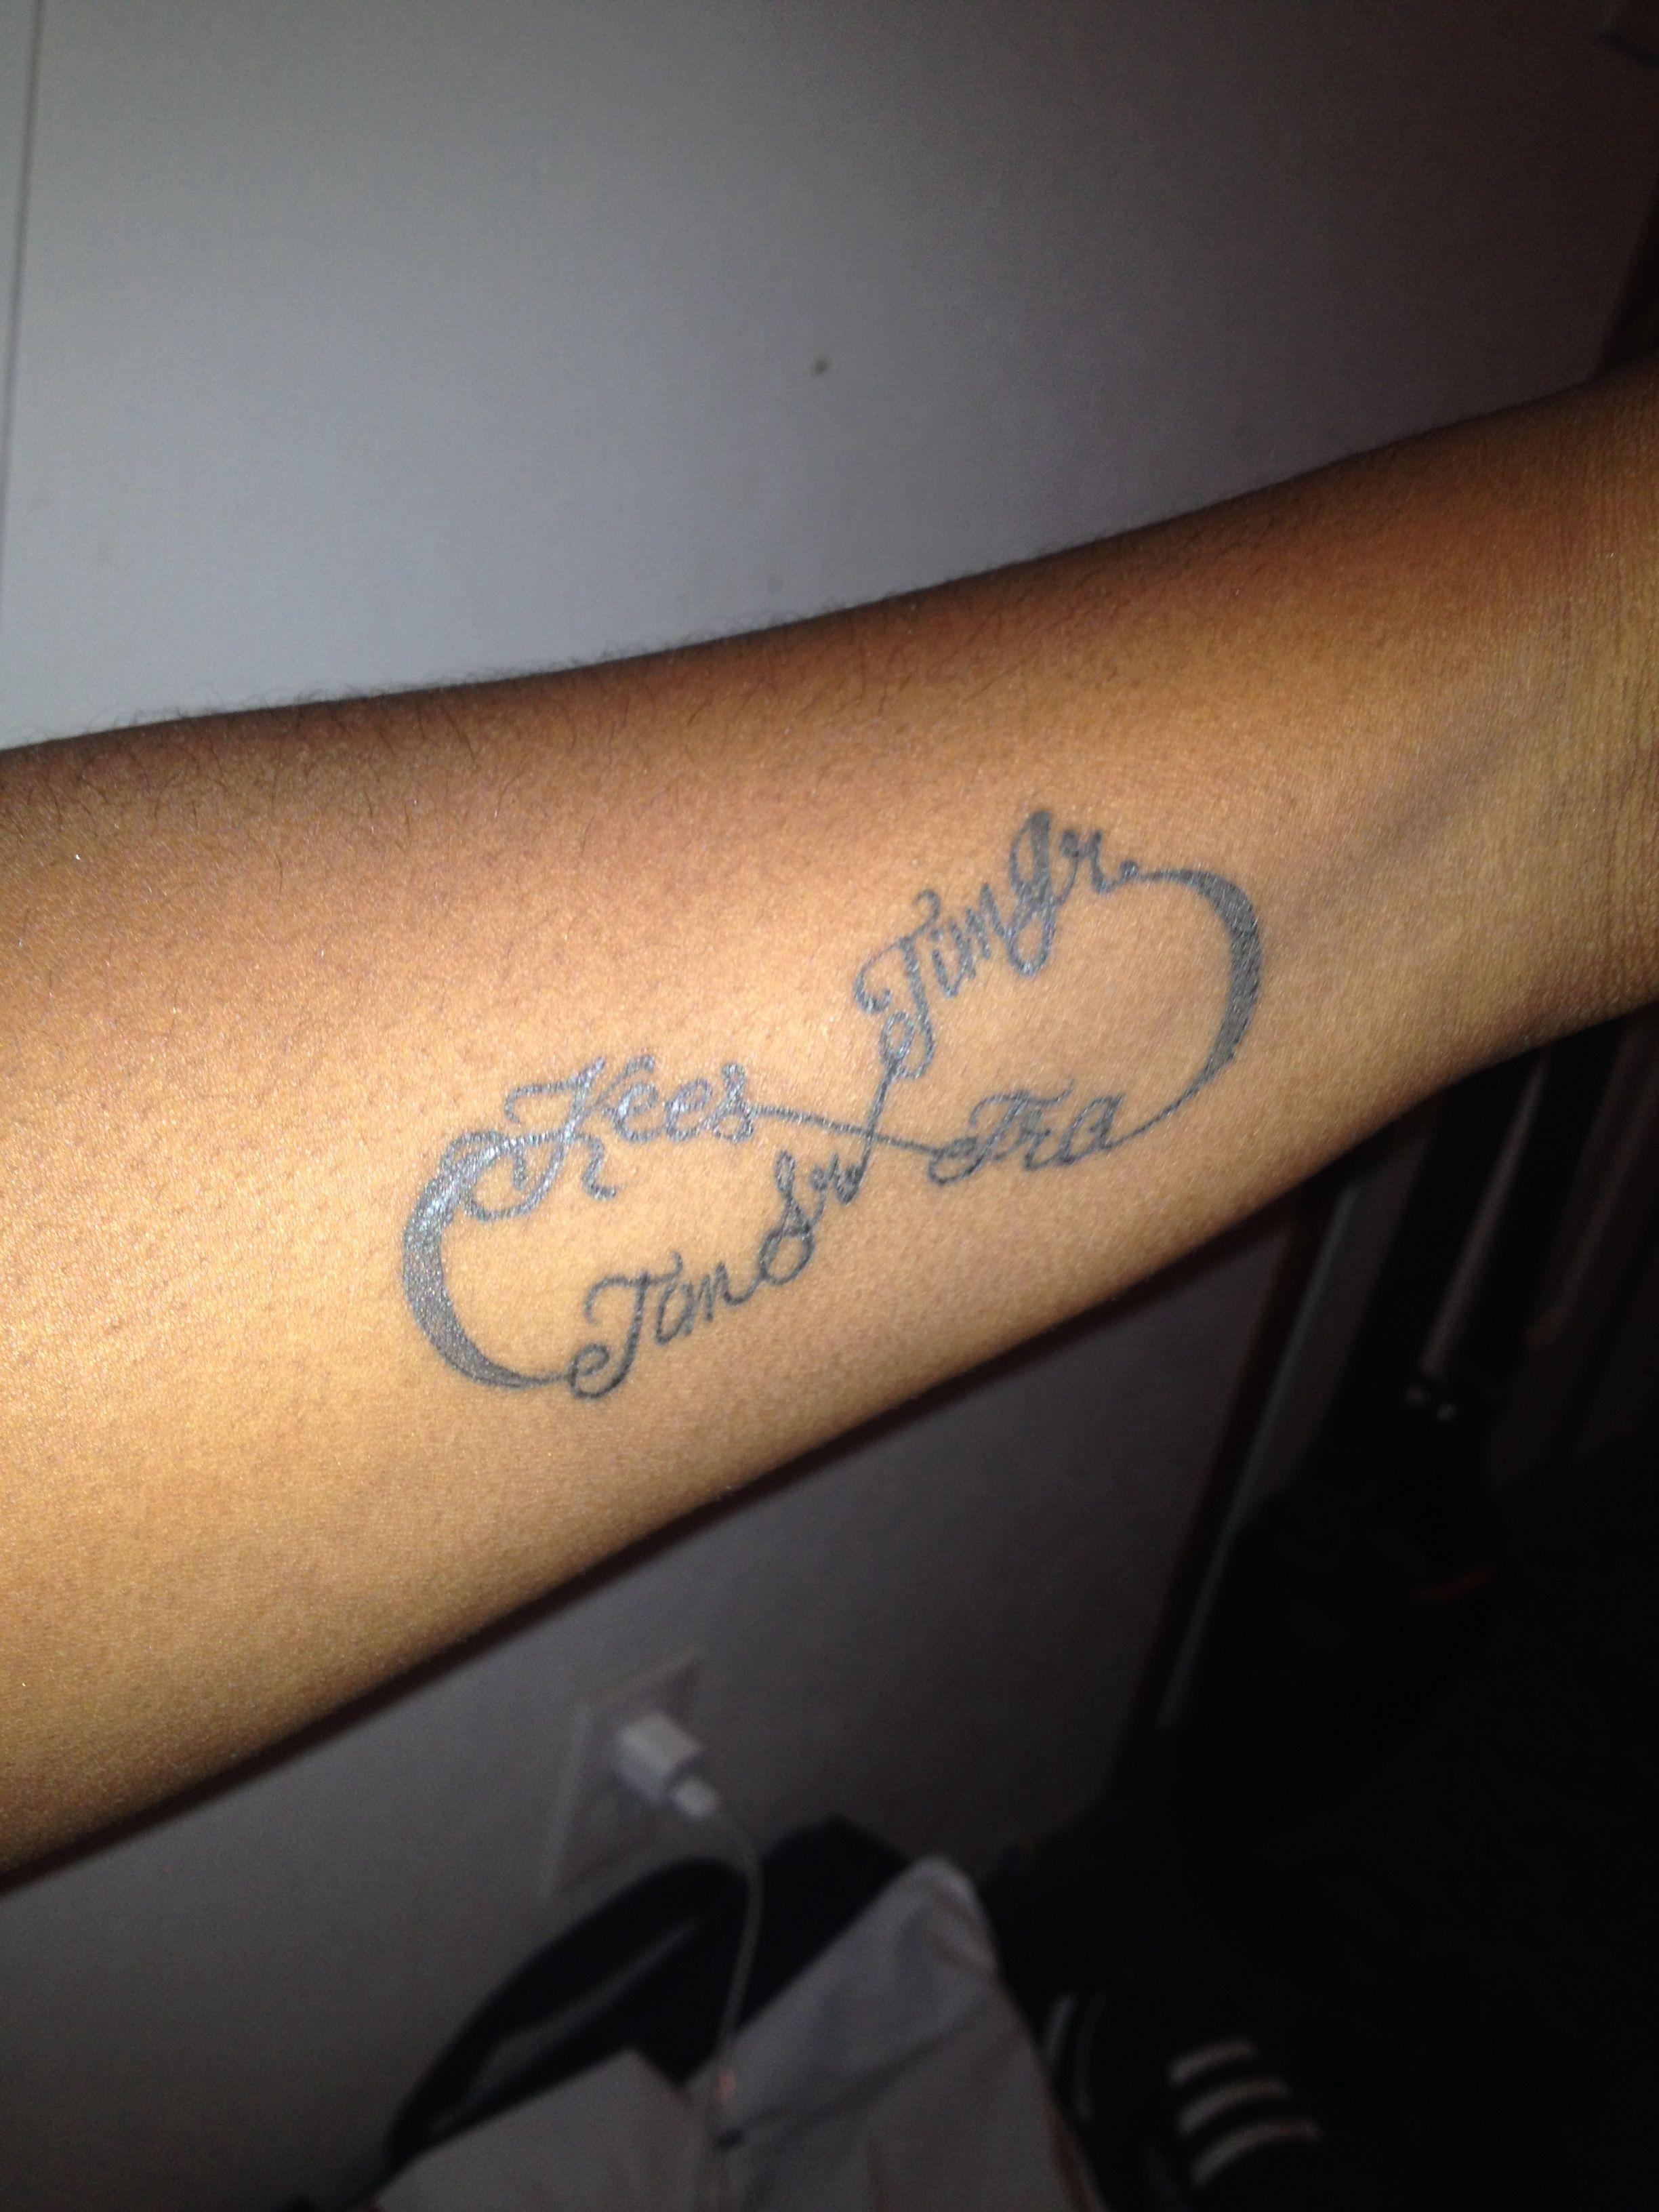 Infinity Tattoo With 3 Names : infinity, tattoo, names, Infinity, Symbol, Husband's, Engraved, Tattoos, Kids,, Mickey, Tattoo,